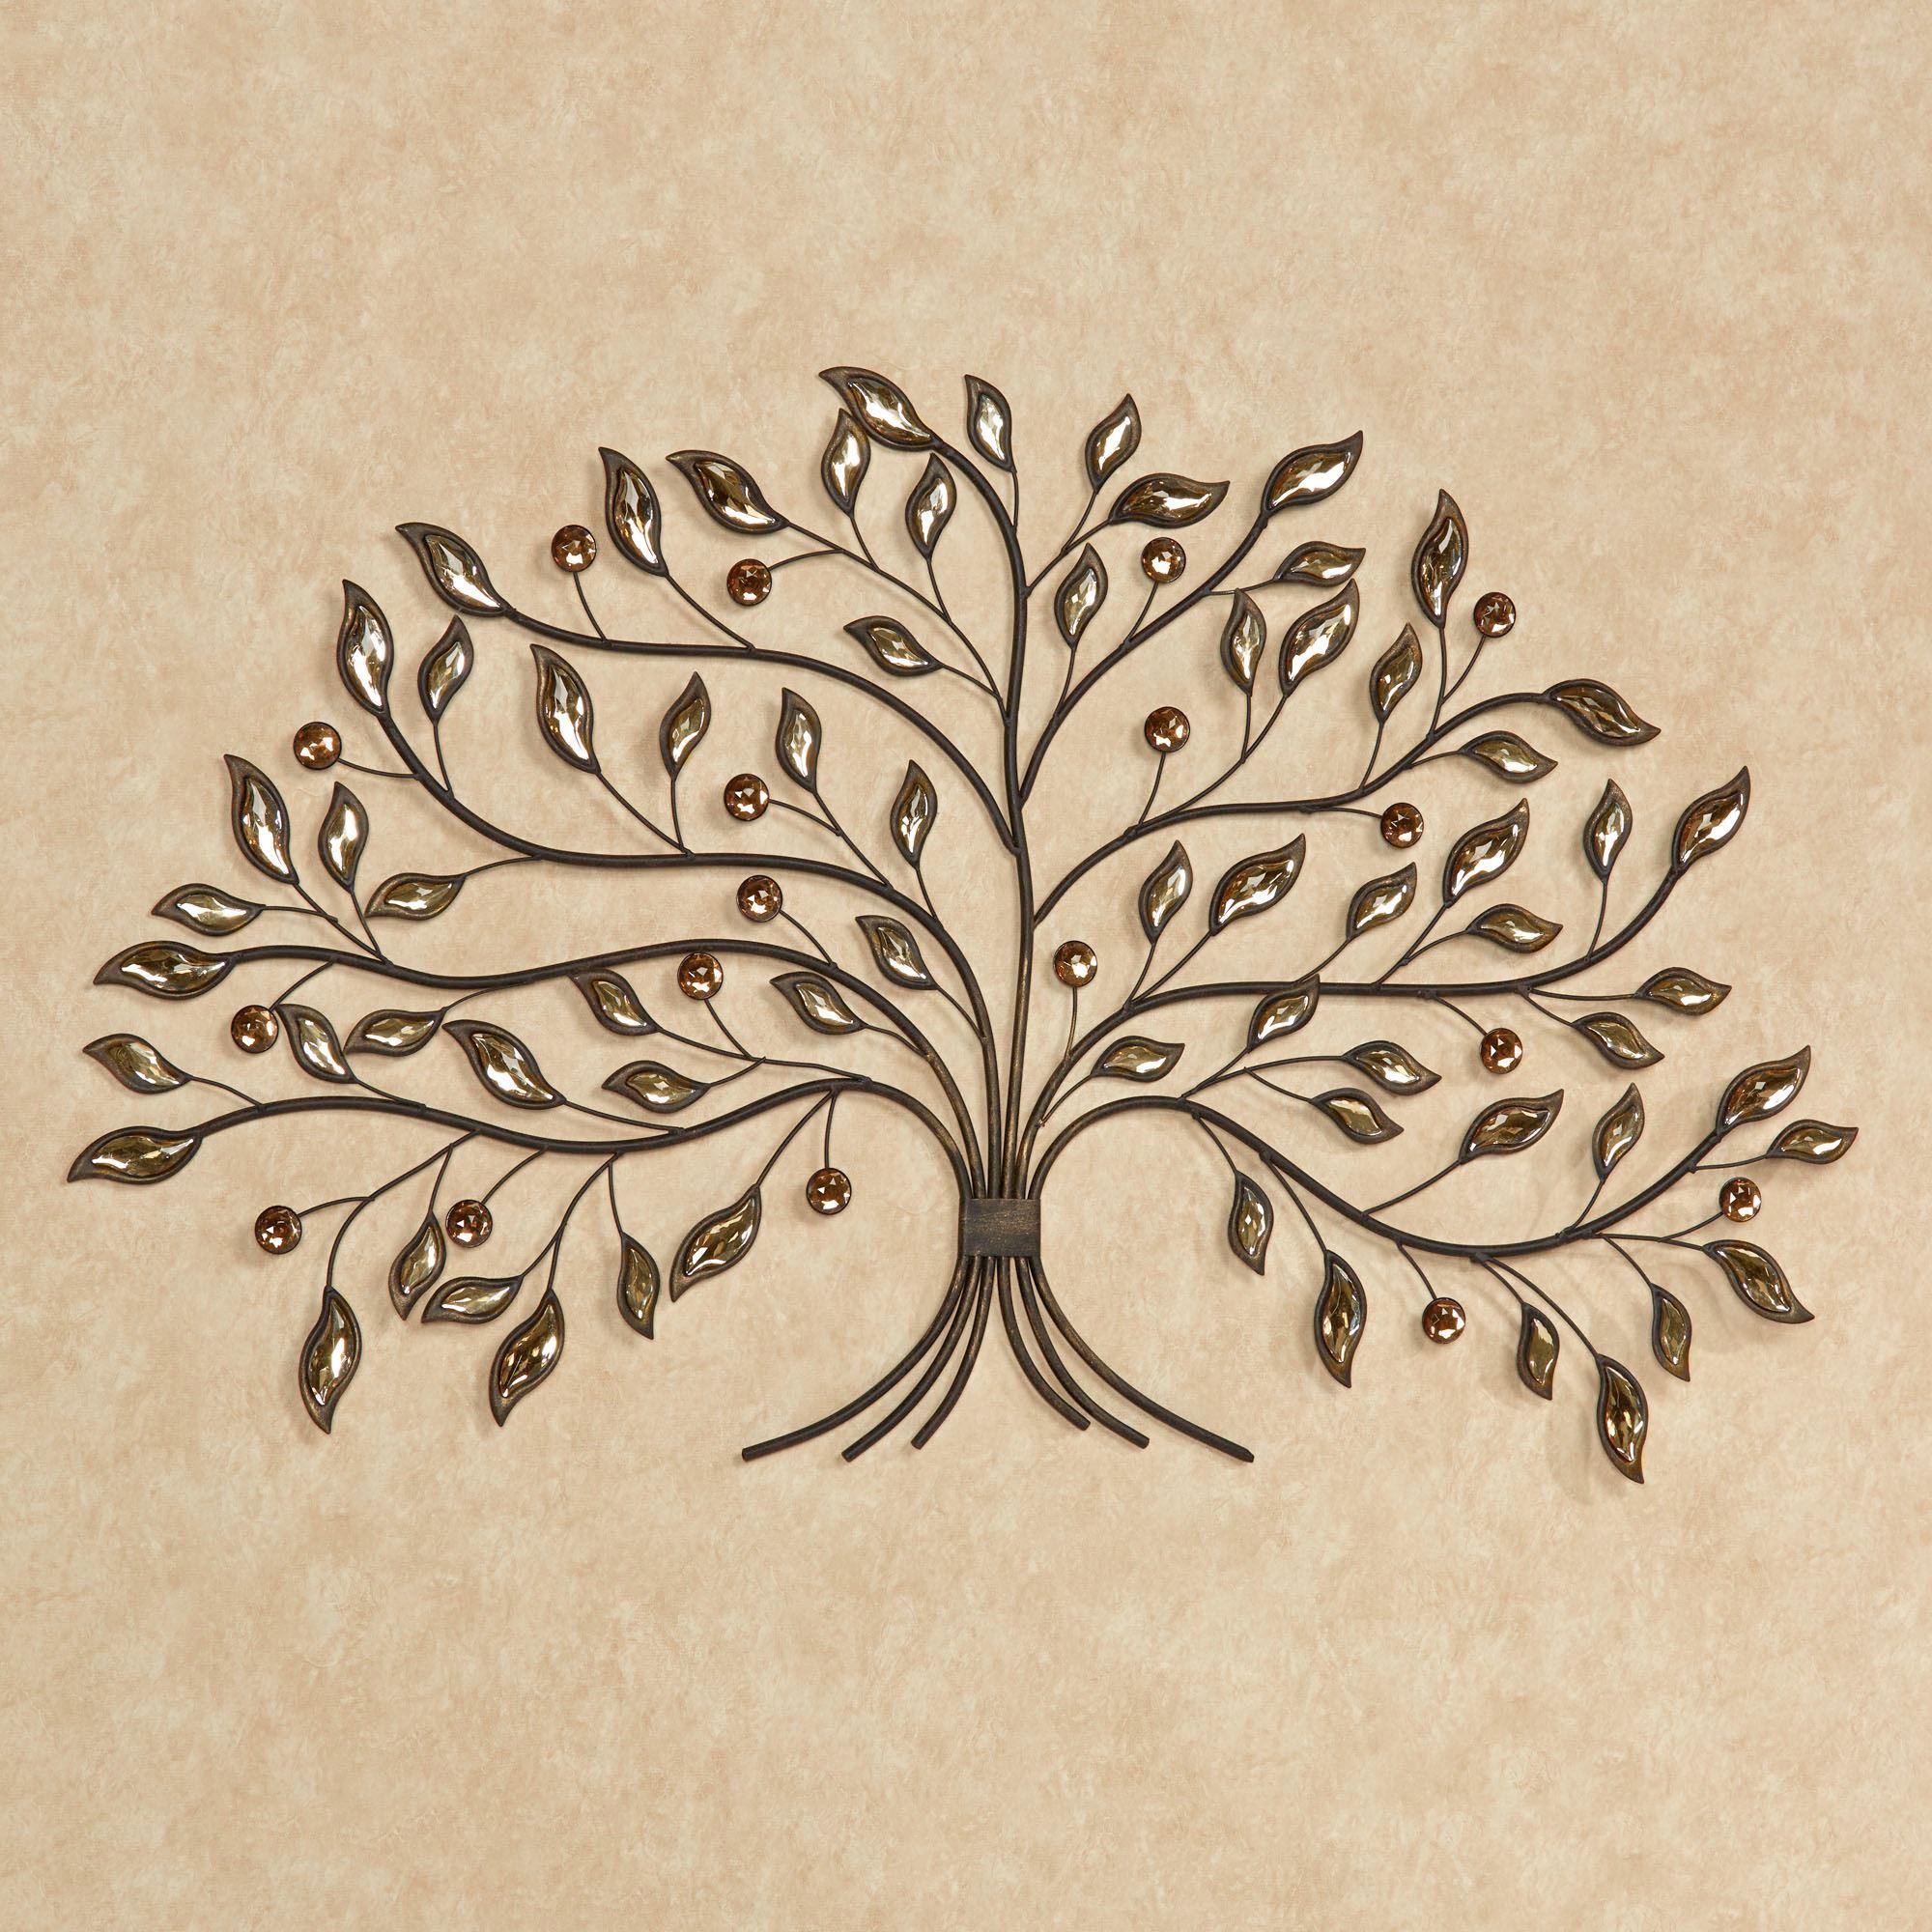 Best ideas about Metal Tree Wall Art . Save or Pin Alexandra Vining Gem Tree Metal Wall Art Now.